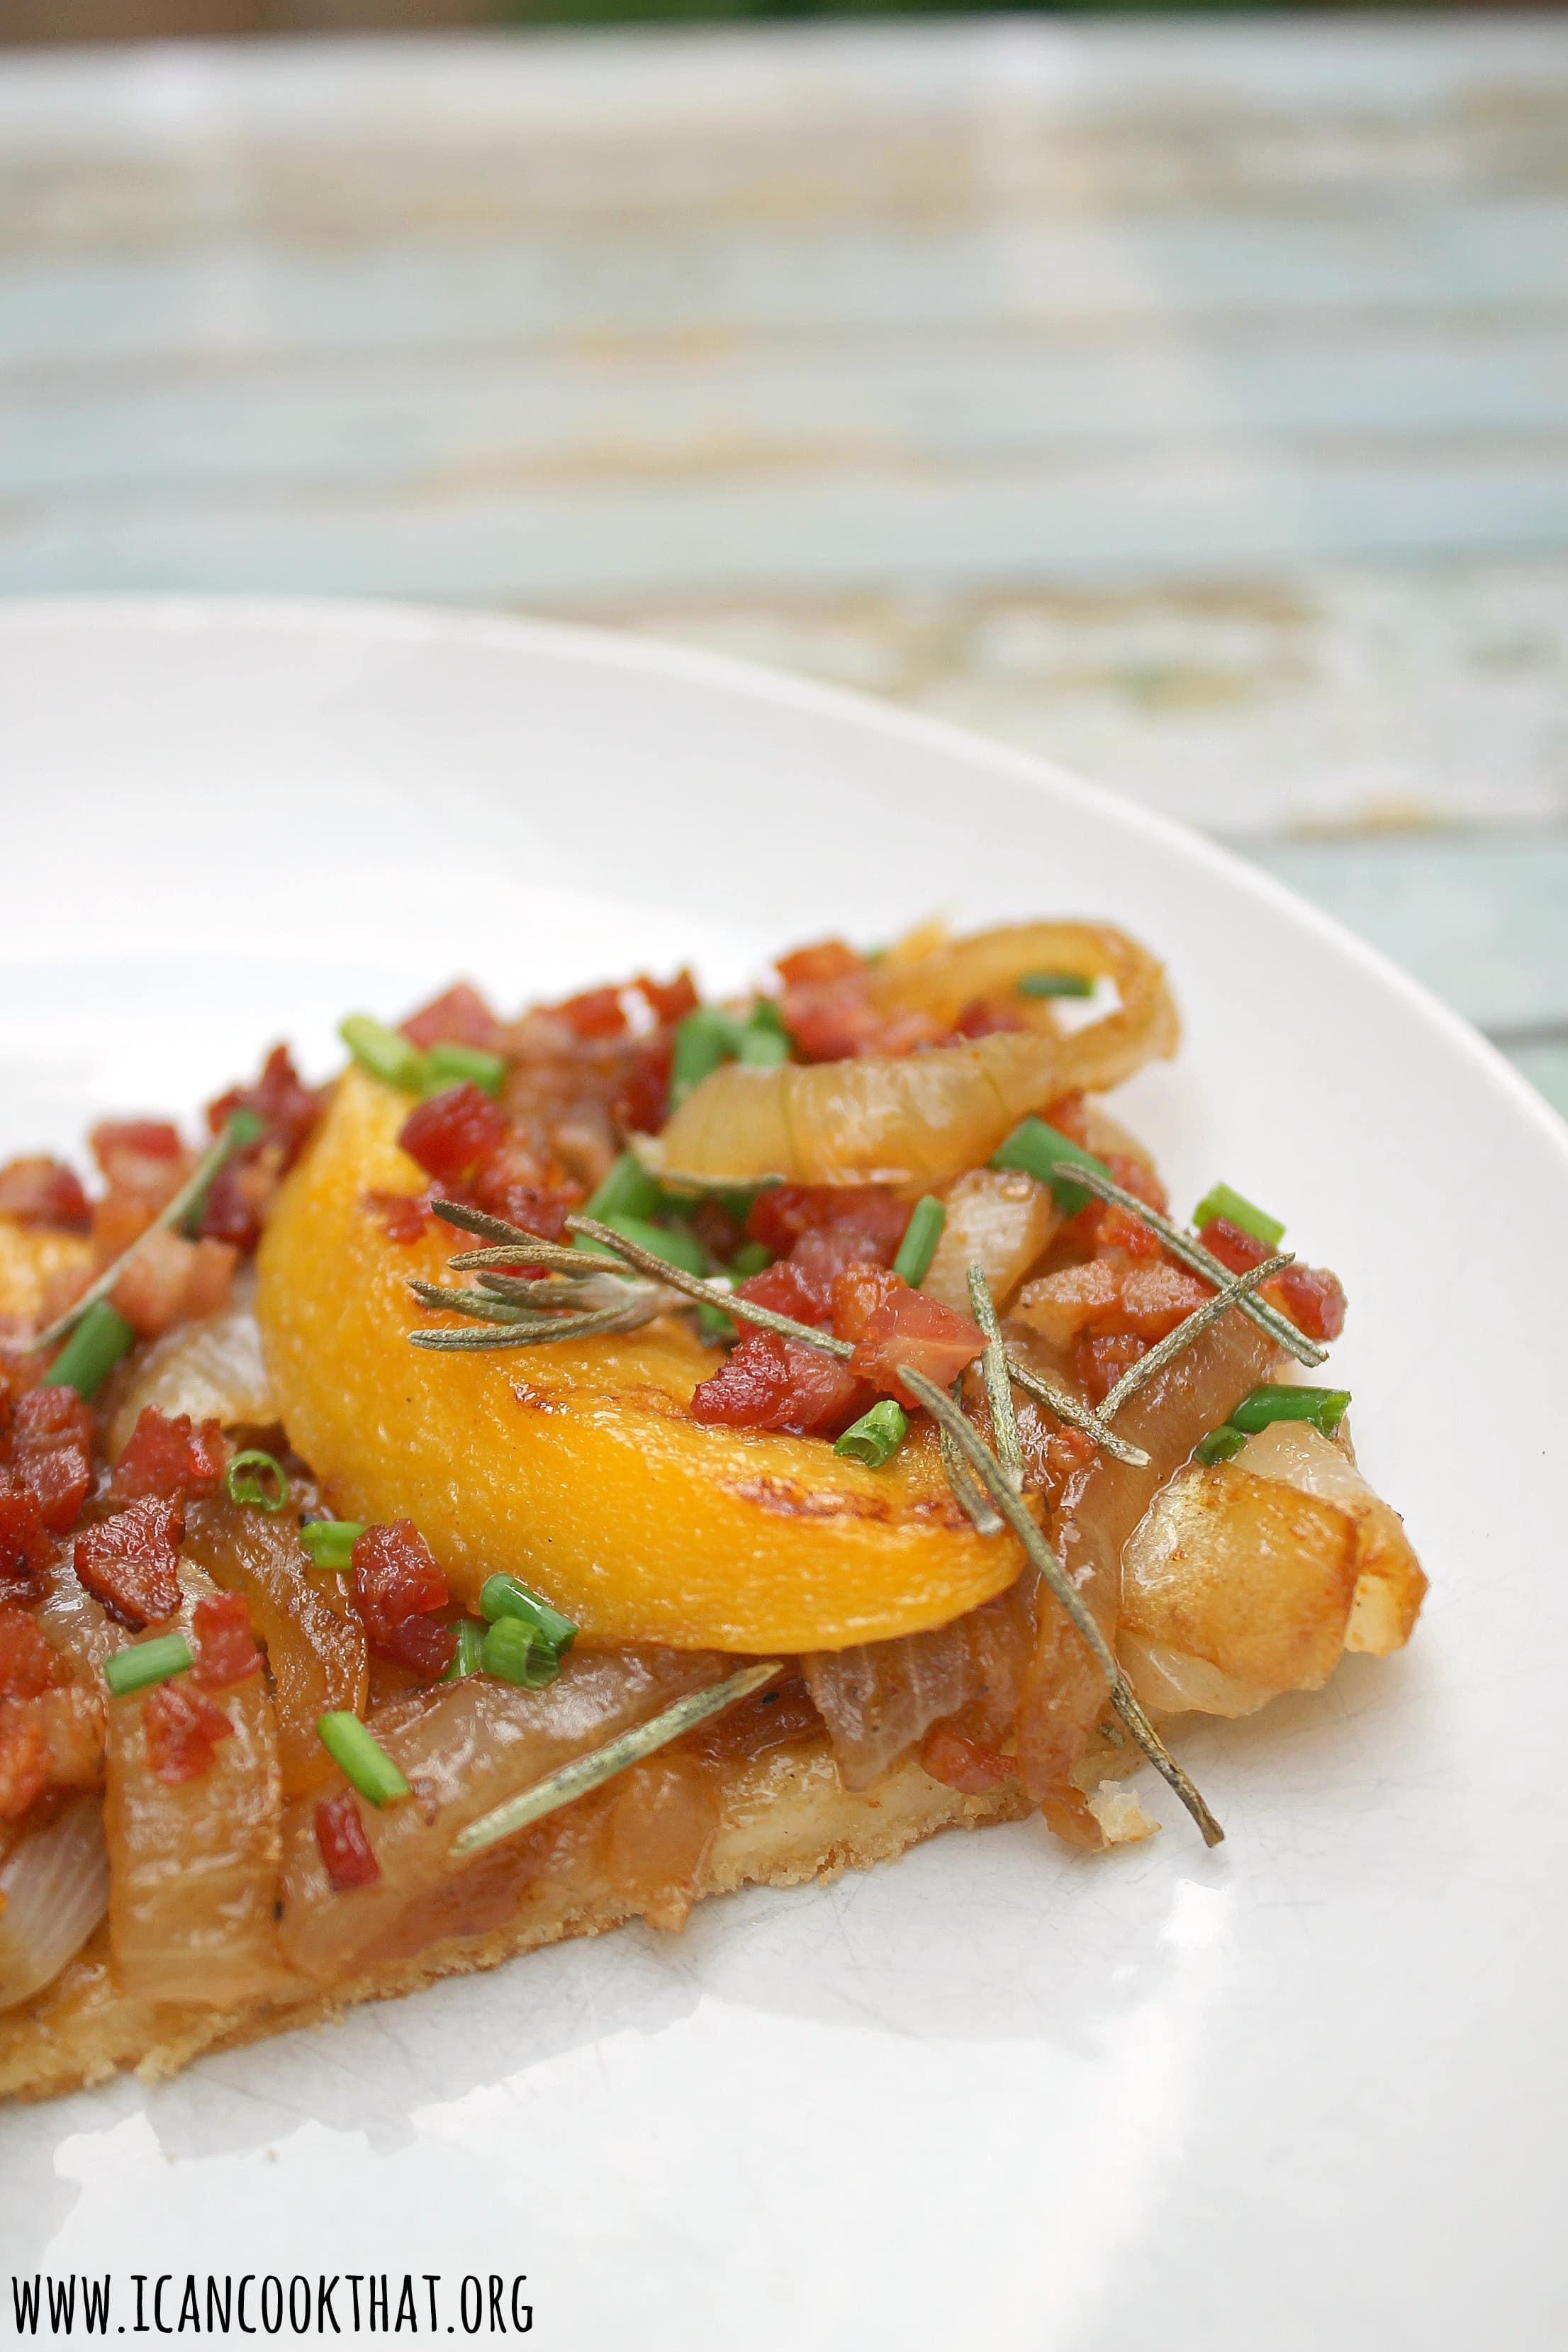 Peach, Vidalia Onion, and Pancetta Flatbread